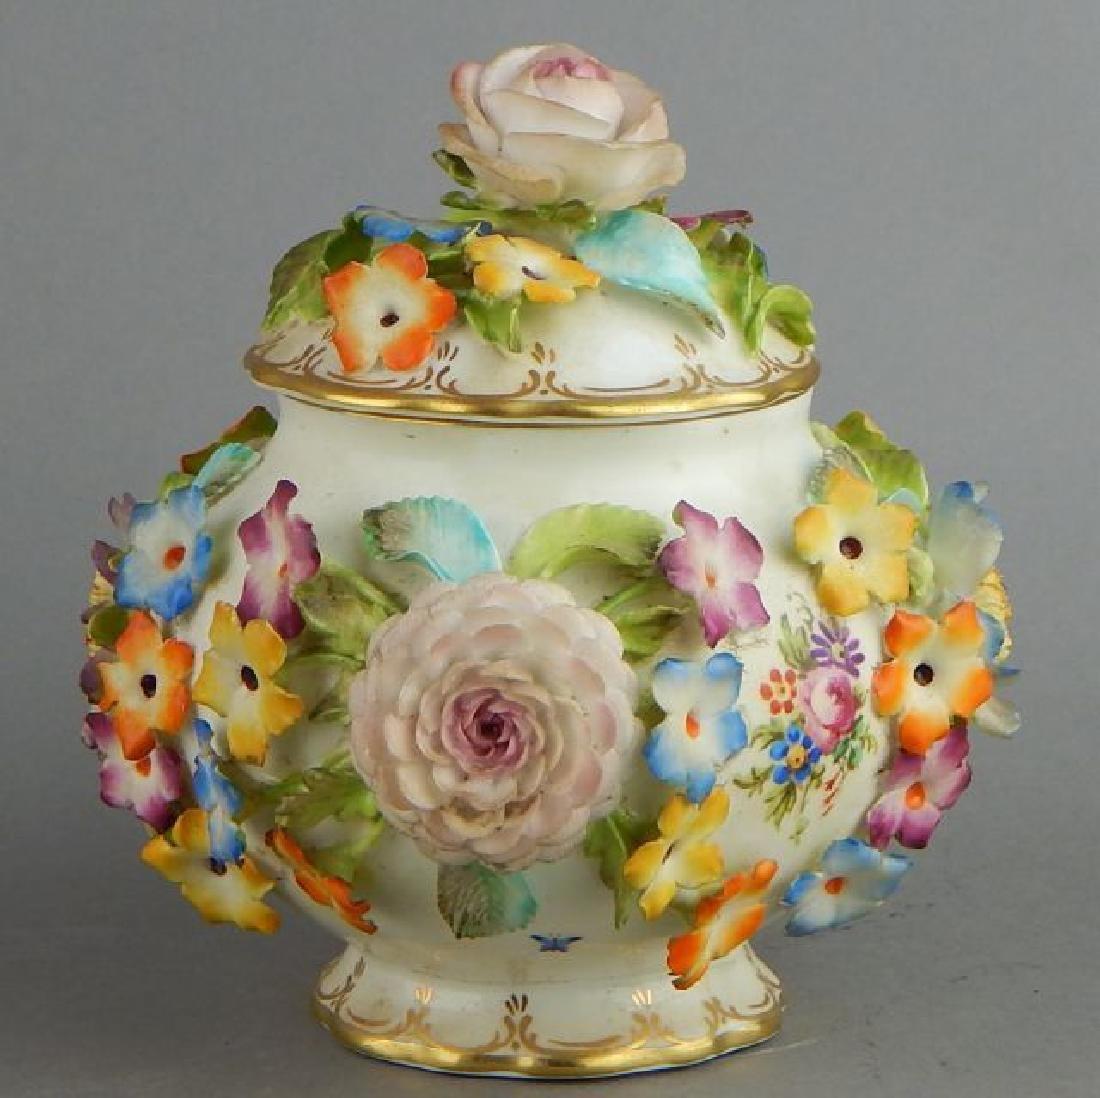 Coal Brookdale Covered Jar with Raised Flowers